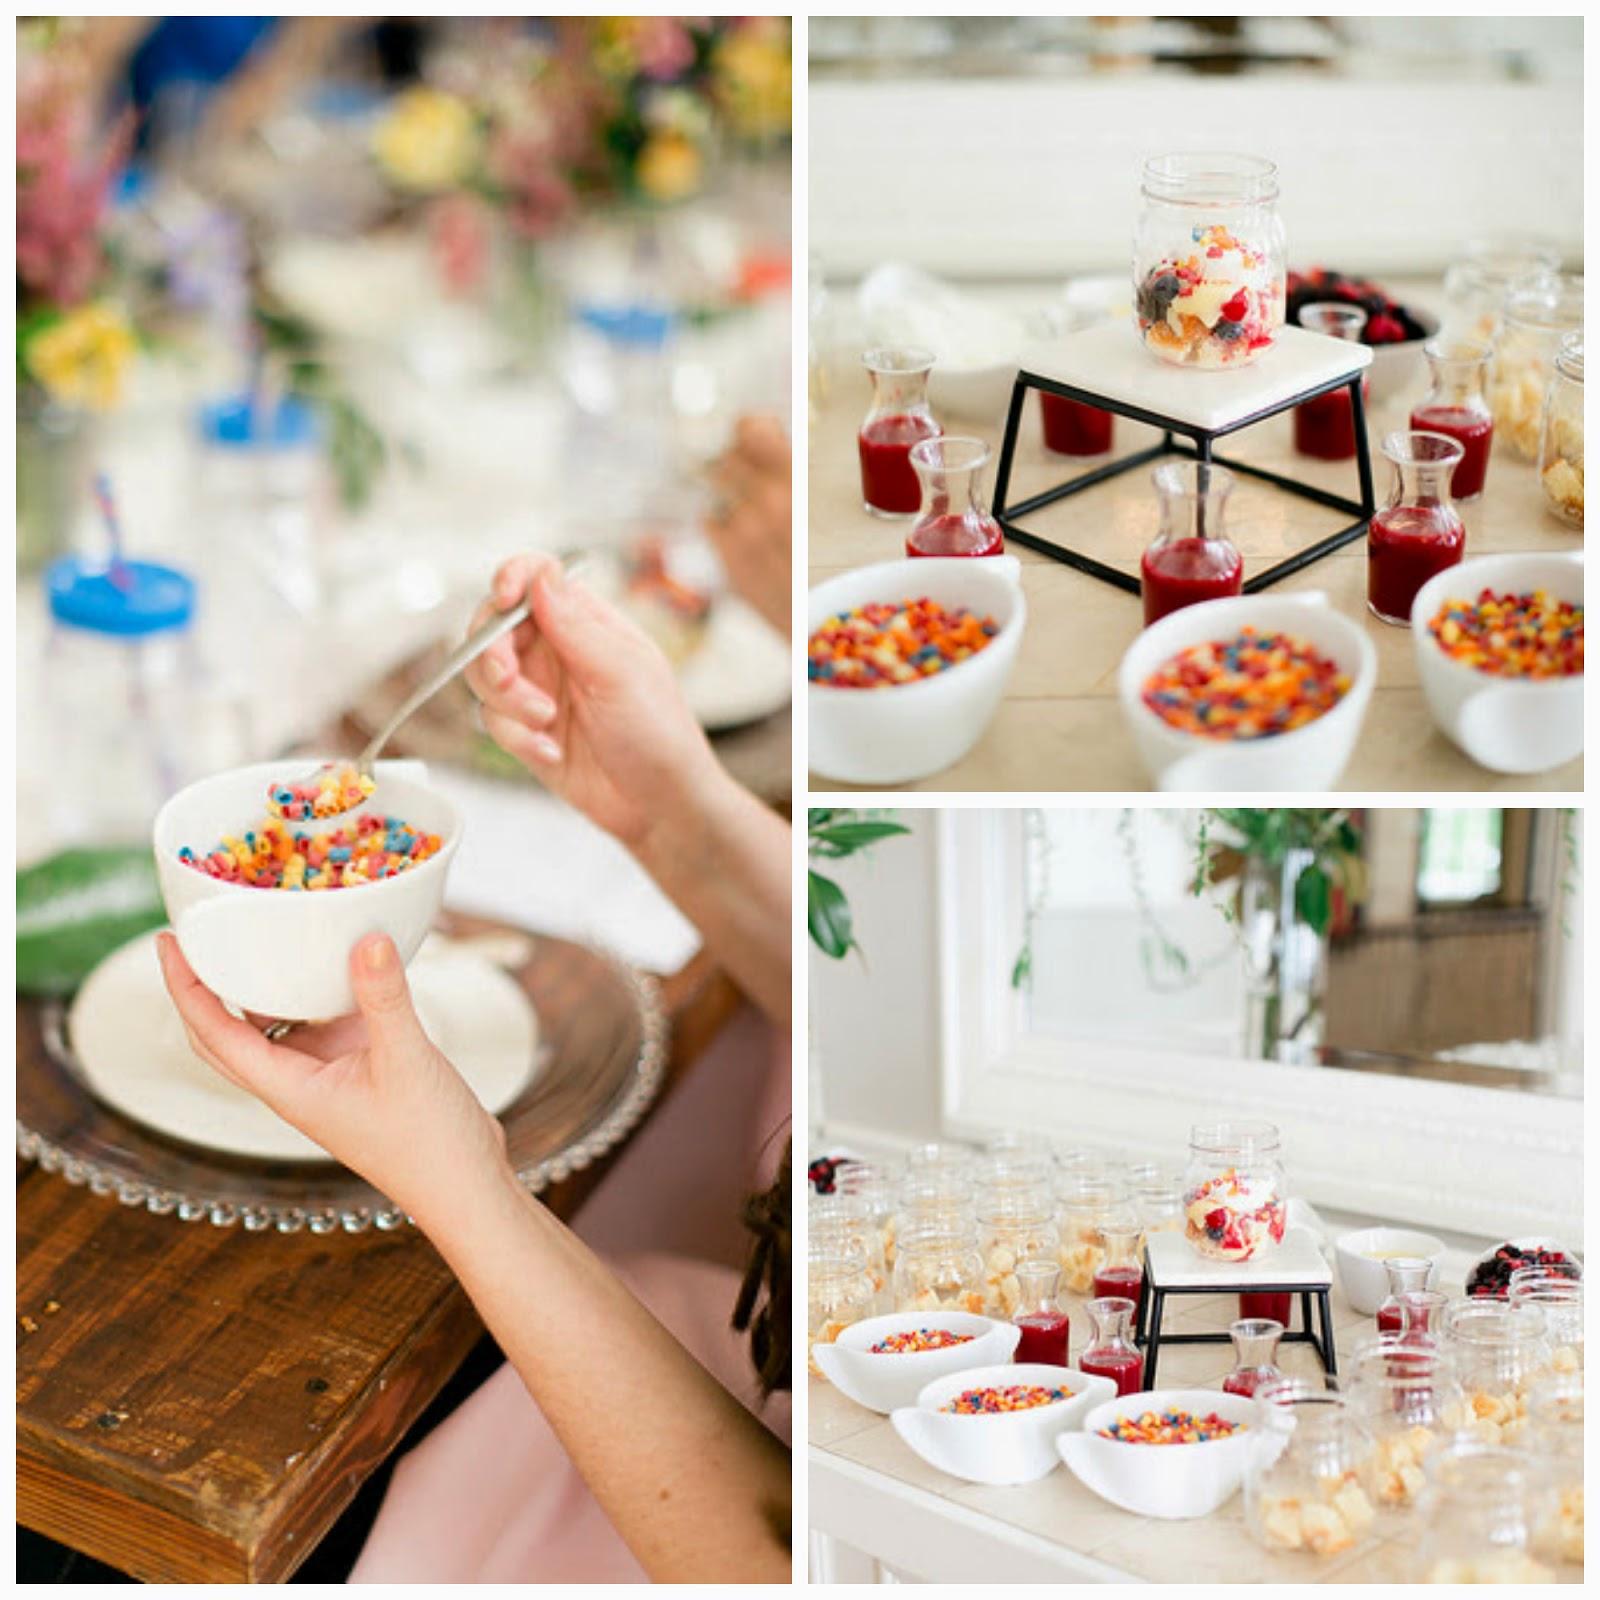 Layered Berry Trifle Dessert Bar